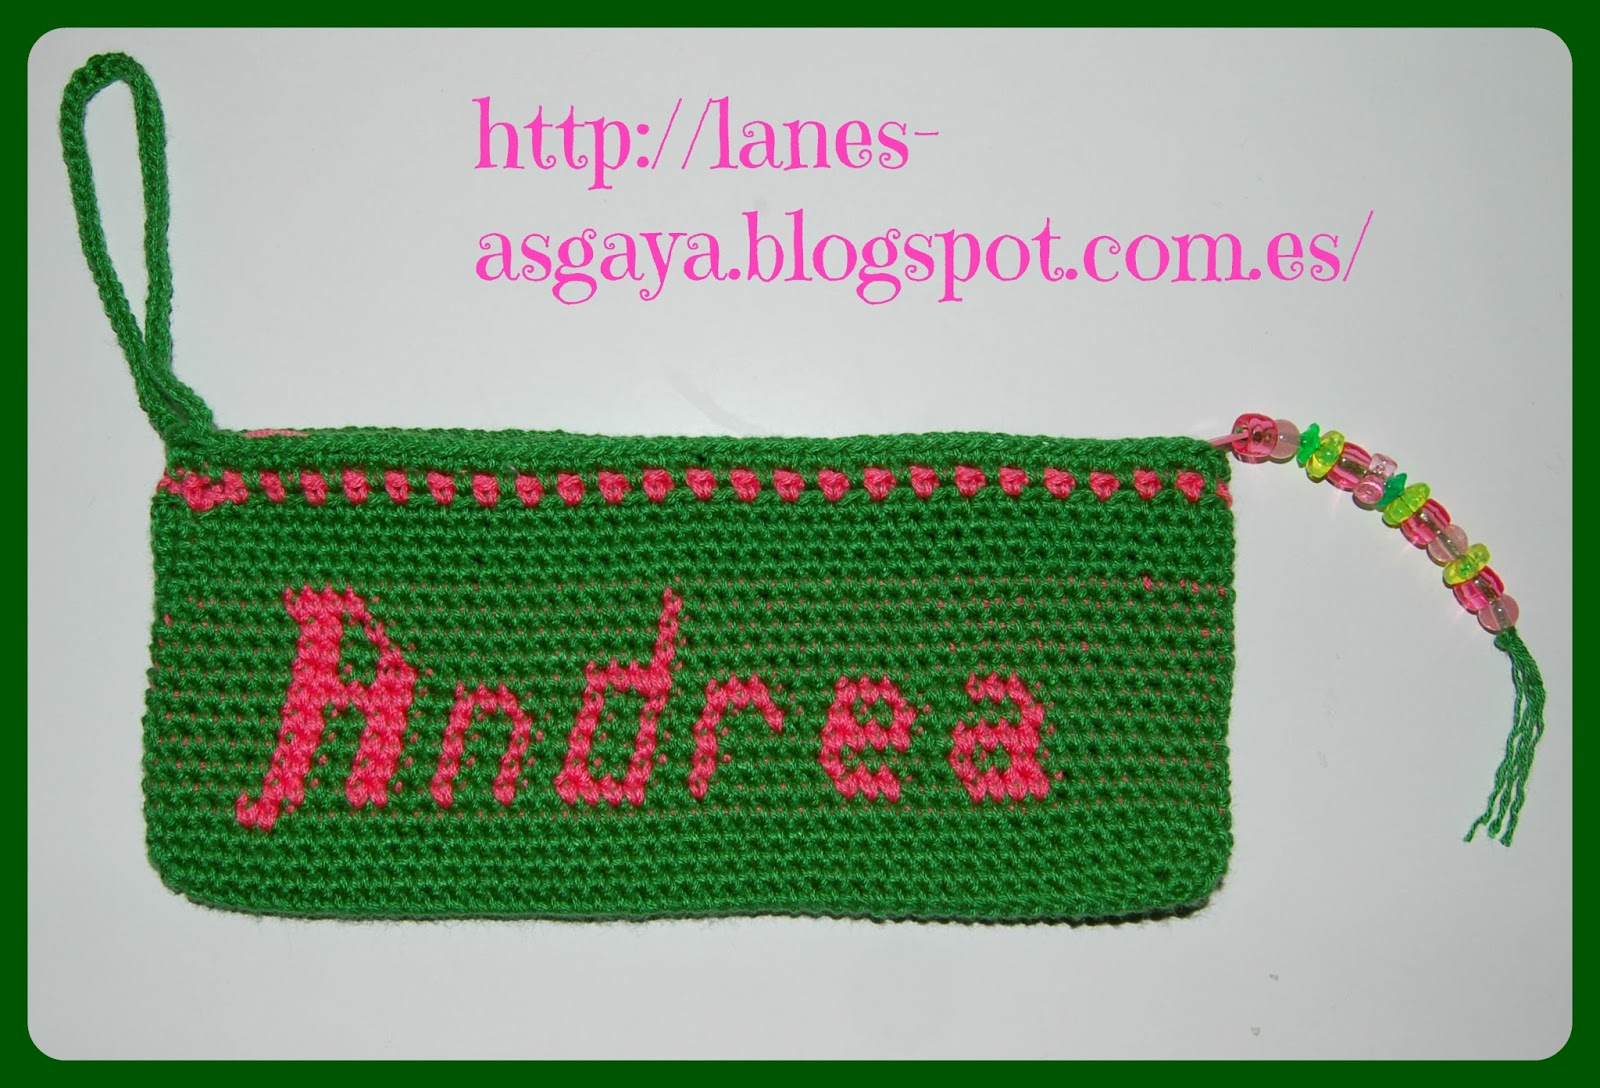 lanes asgaya: ESTUCHE A TAPESTRY CROCHET